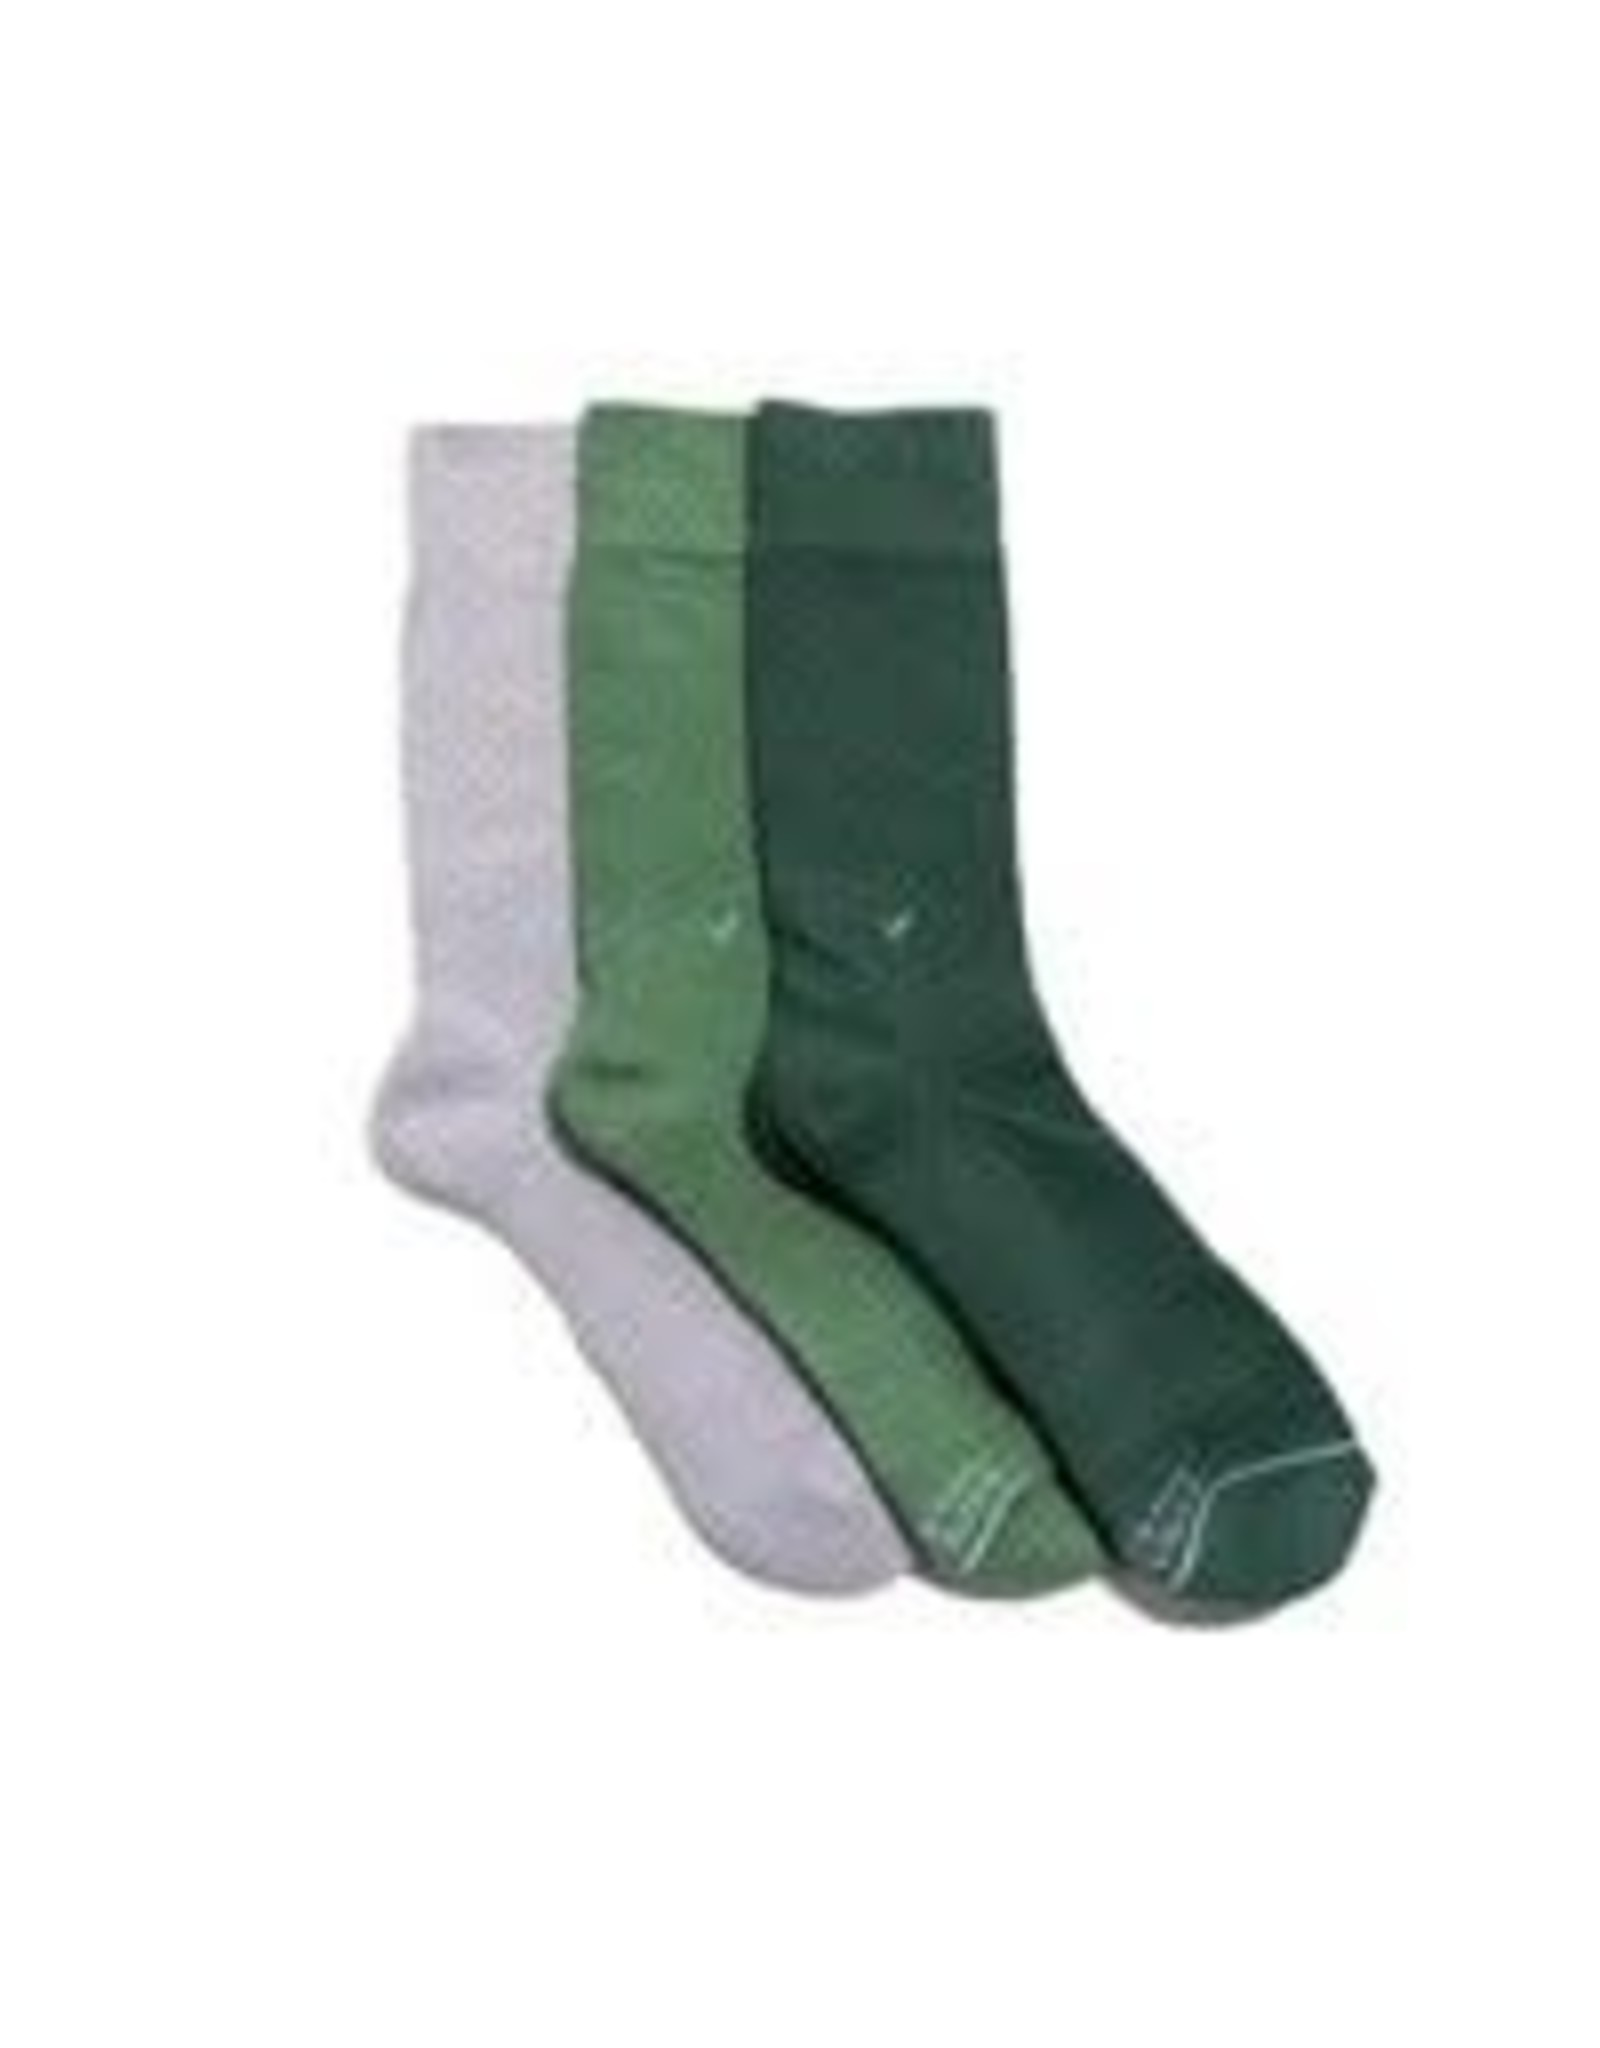 Socks that Plant Trees, Set of 3